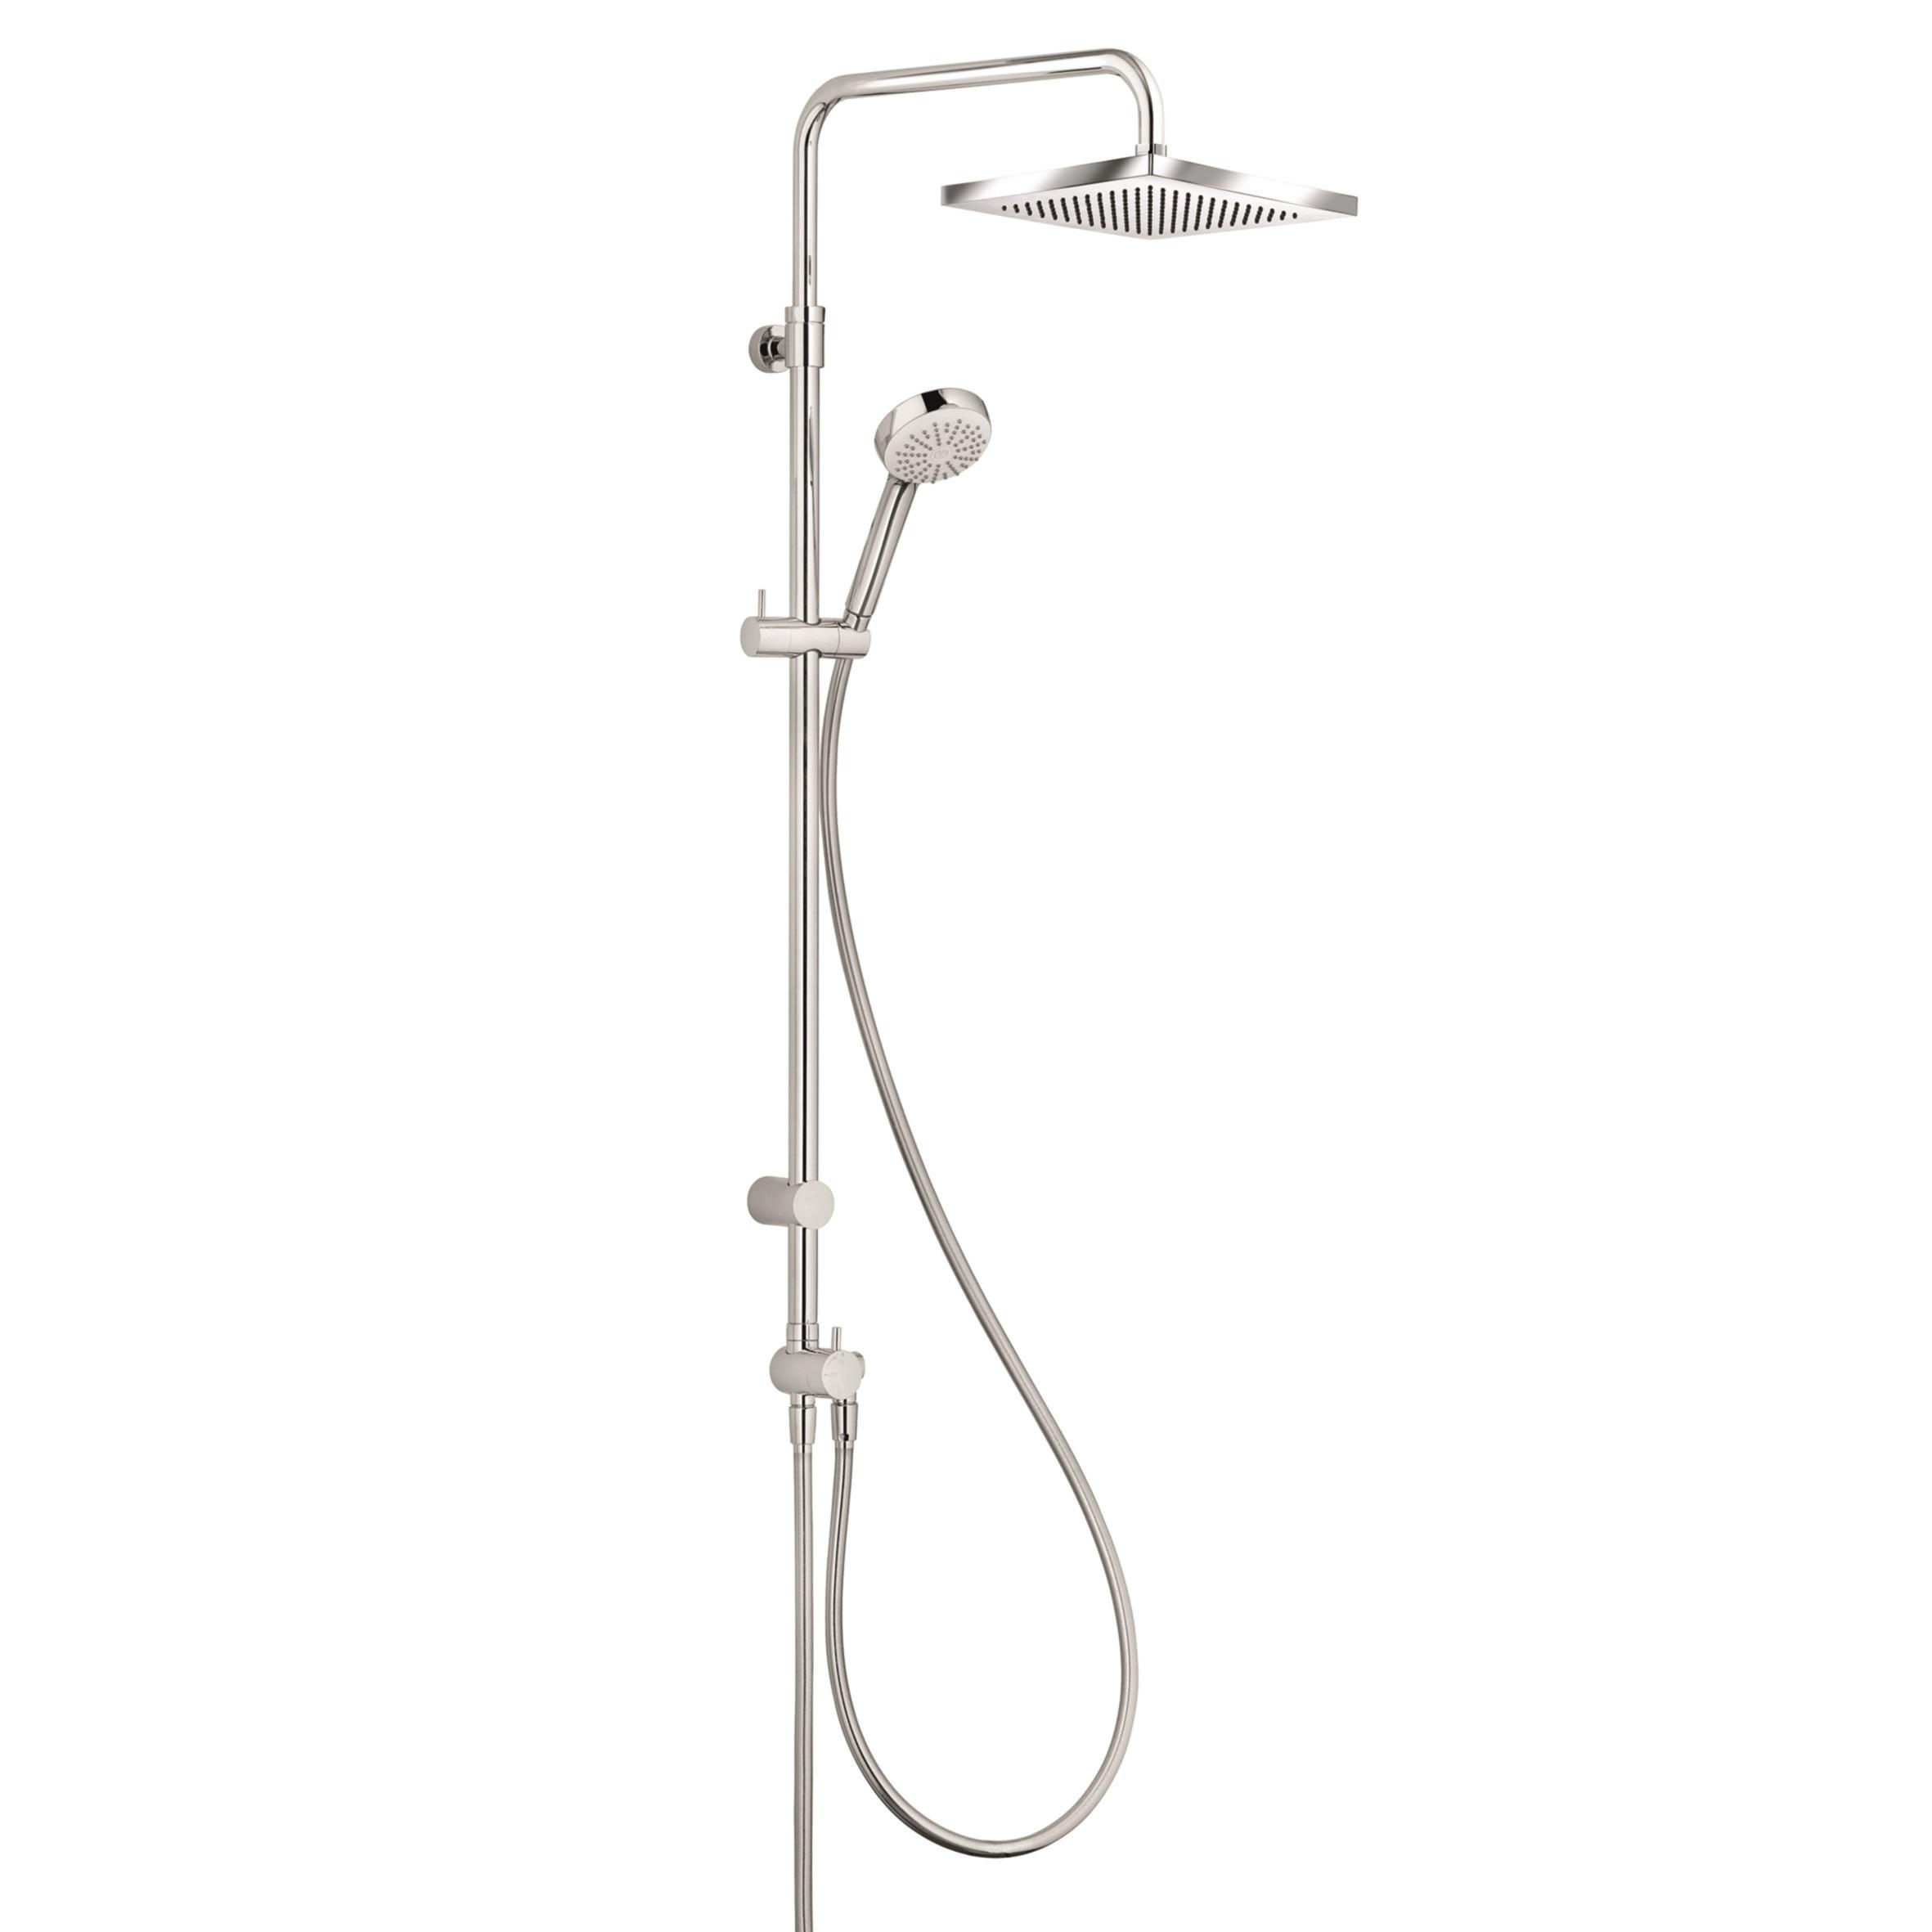 Coloana de dus Kludi Logo 1S Dual Shower fara baterie de dus imagine